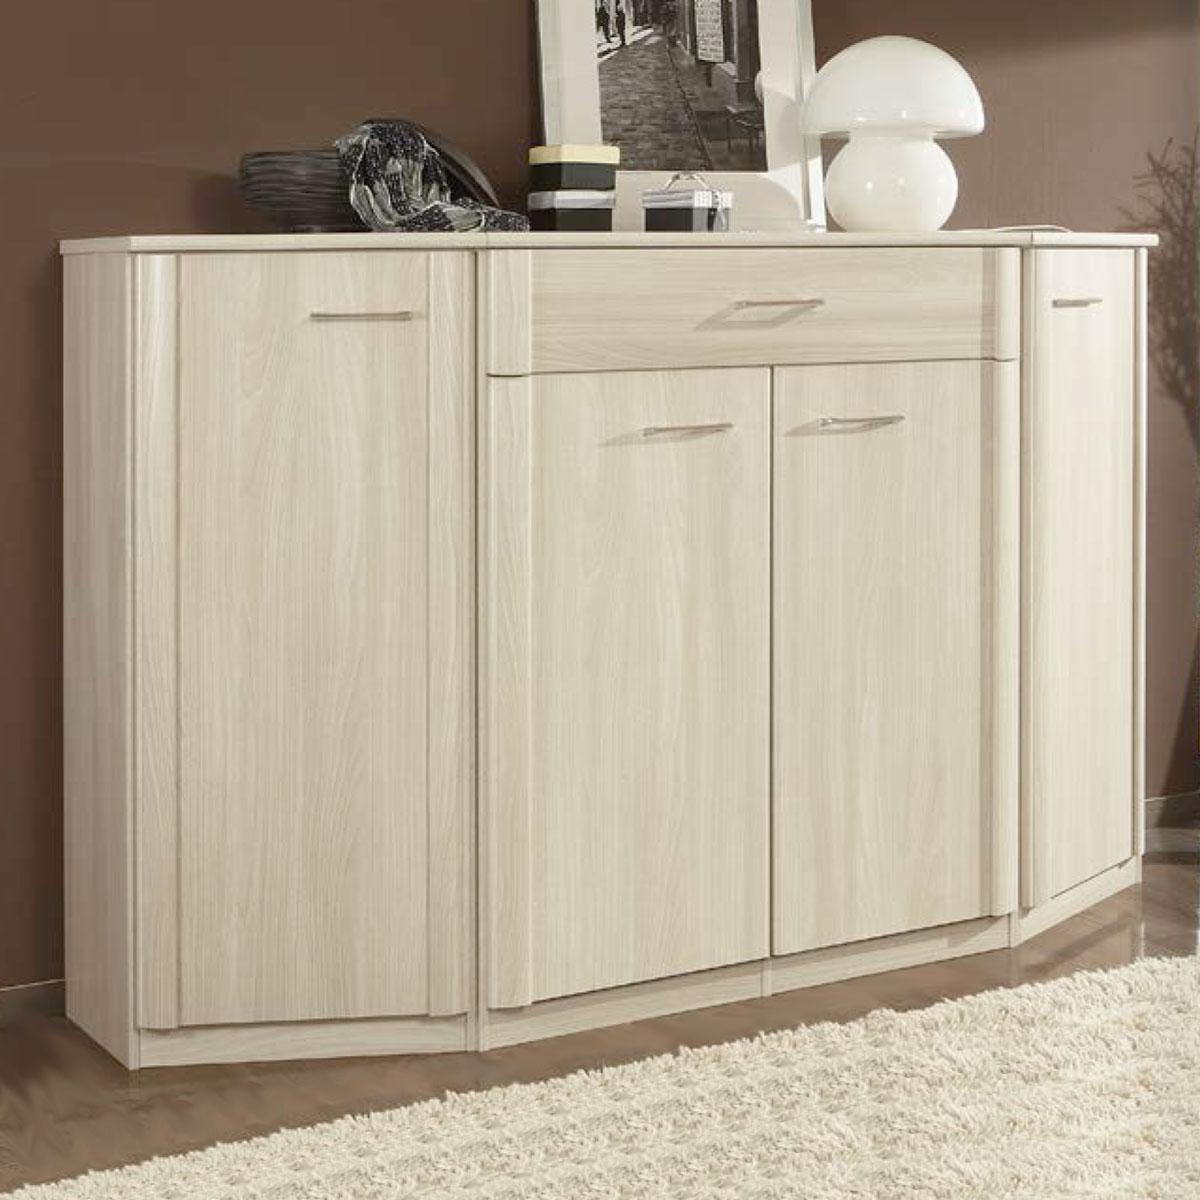 wiemann luxor 3 4 schlafzimmer schrank kommode mit abgeschragten abschlusselementen farbausfuhrung wahlbar 2